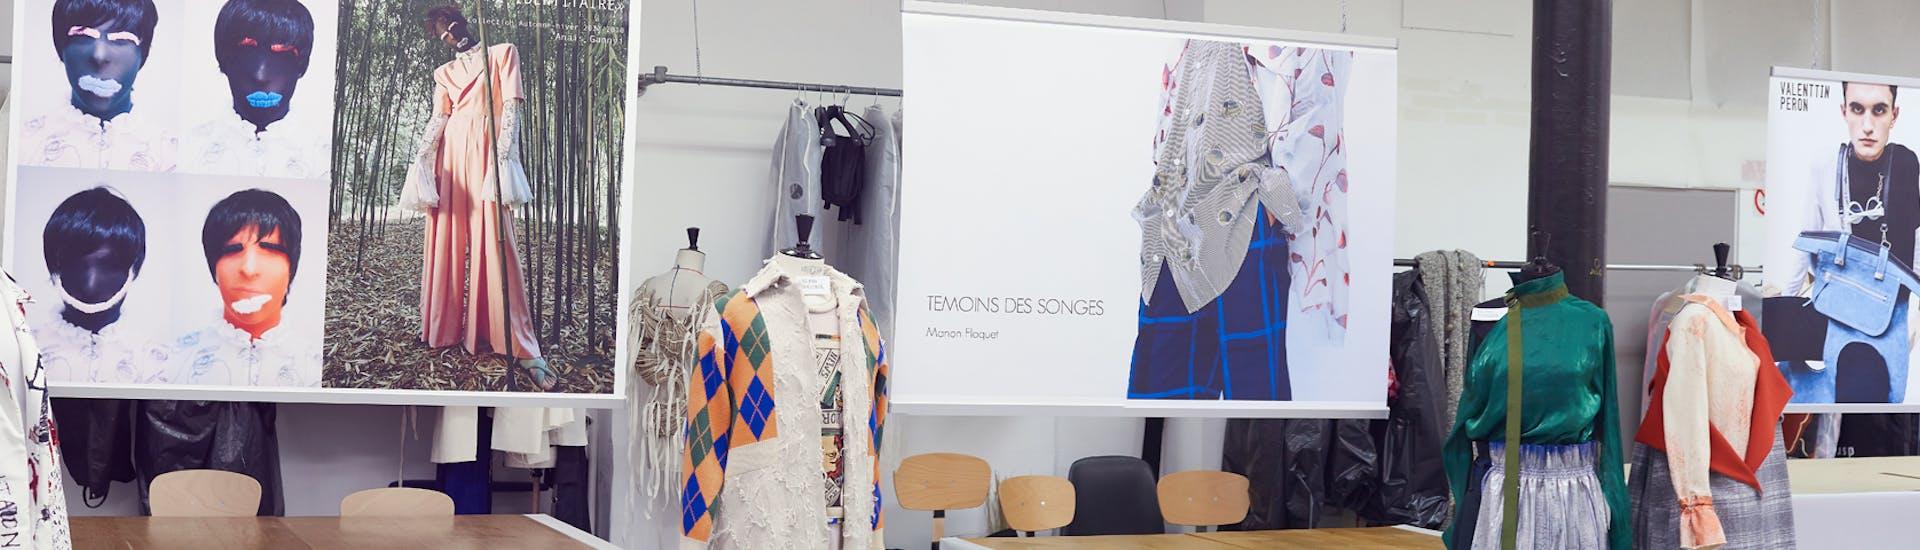 Fashion Designer Bachelor Atelier Chardon Savard Paris France Mastersportal Com